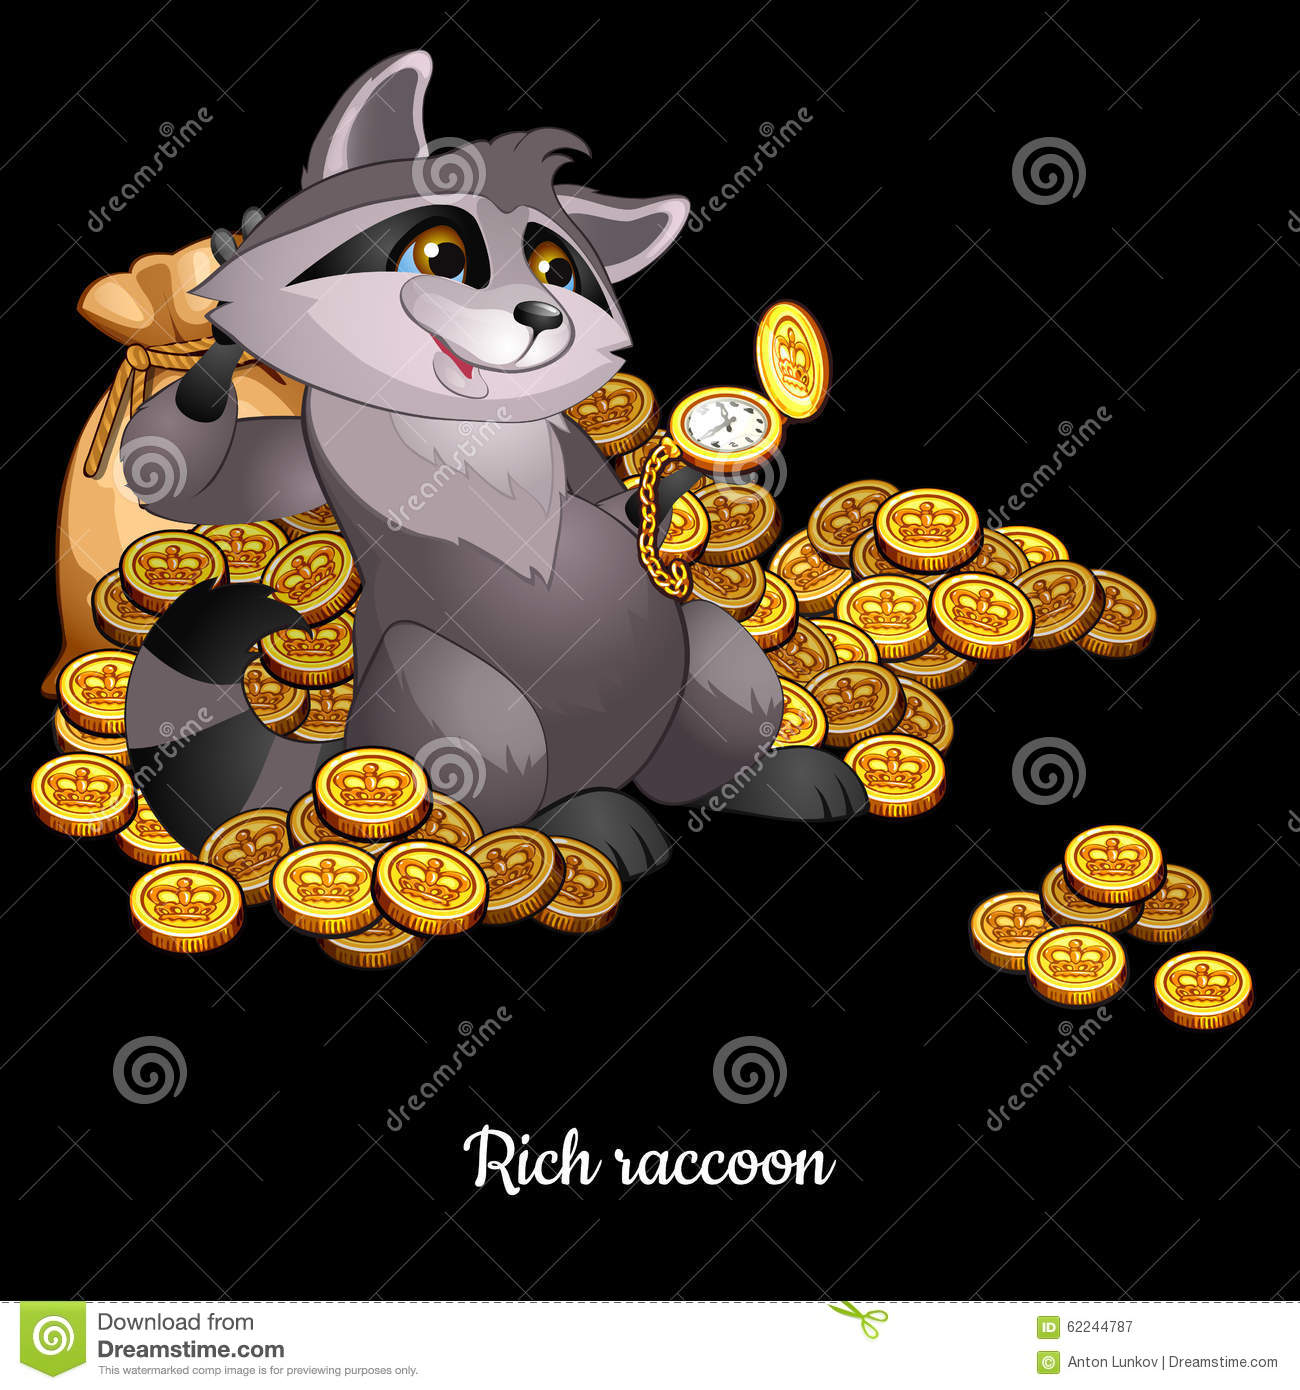 Rich Raccoon Awash In Money, Black Background Stock Vector.